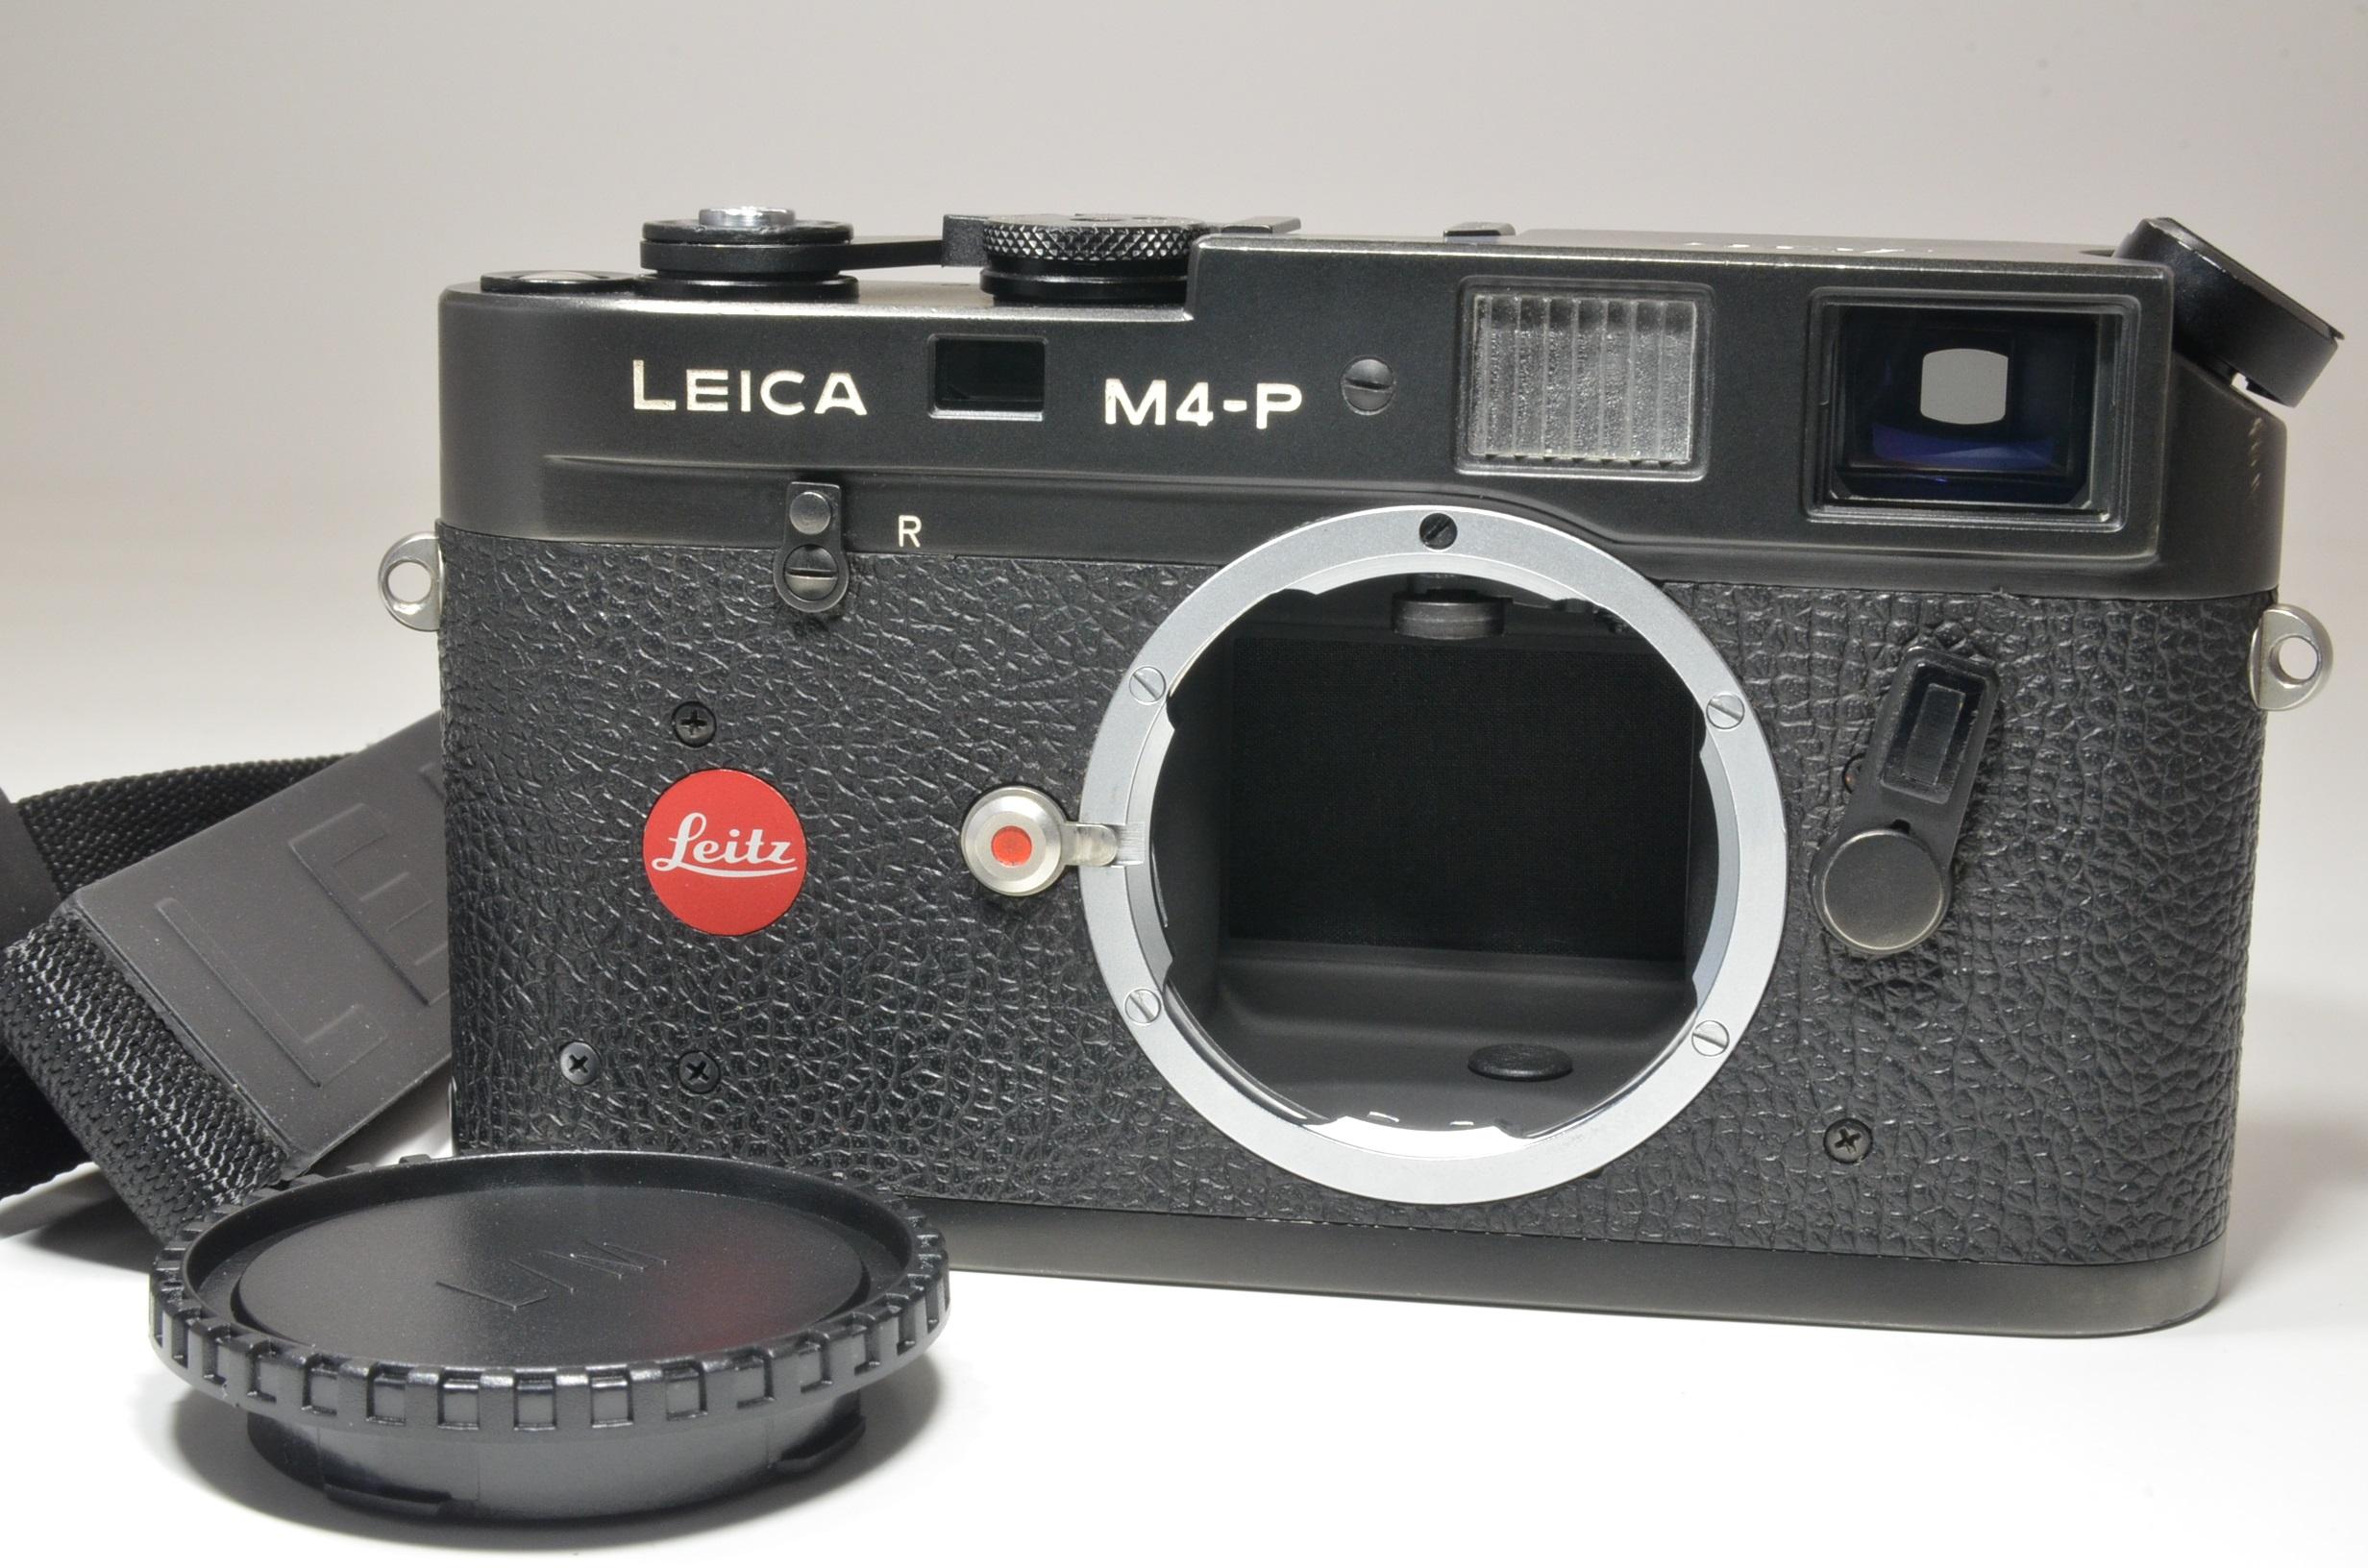 leica m4-p black 35mm rangefinder film camera s/n *1552782 w/ strap